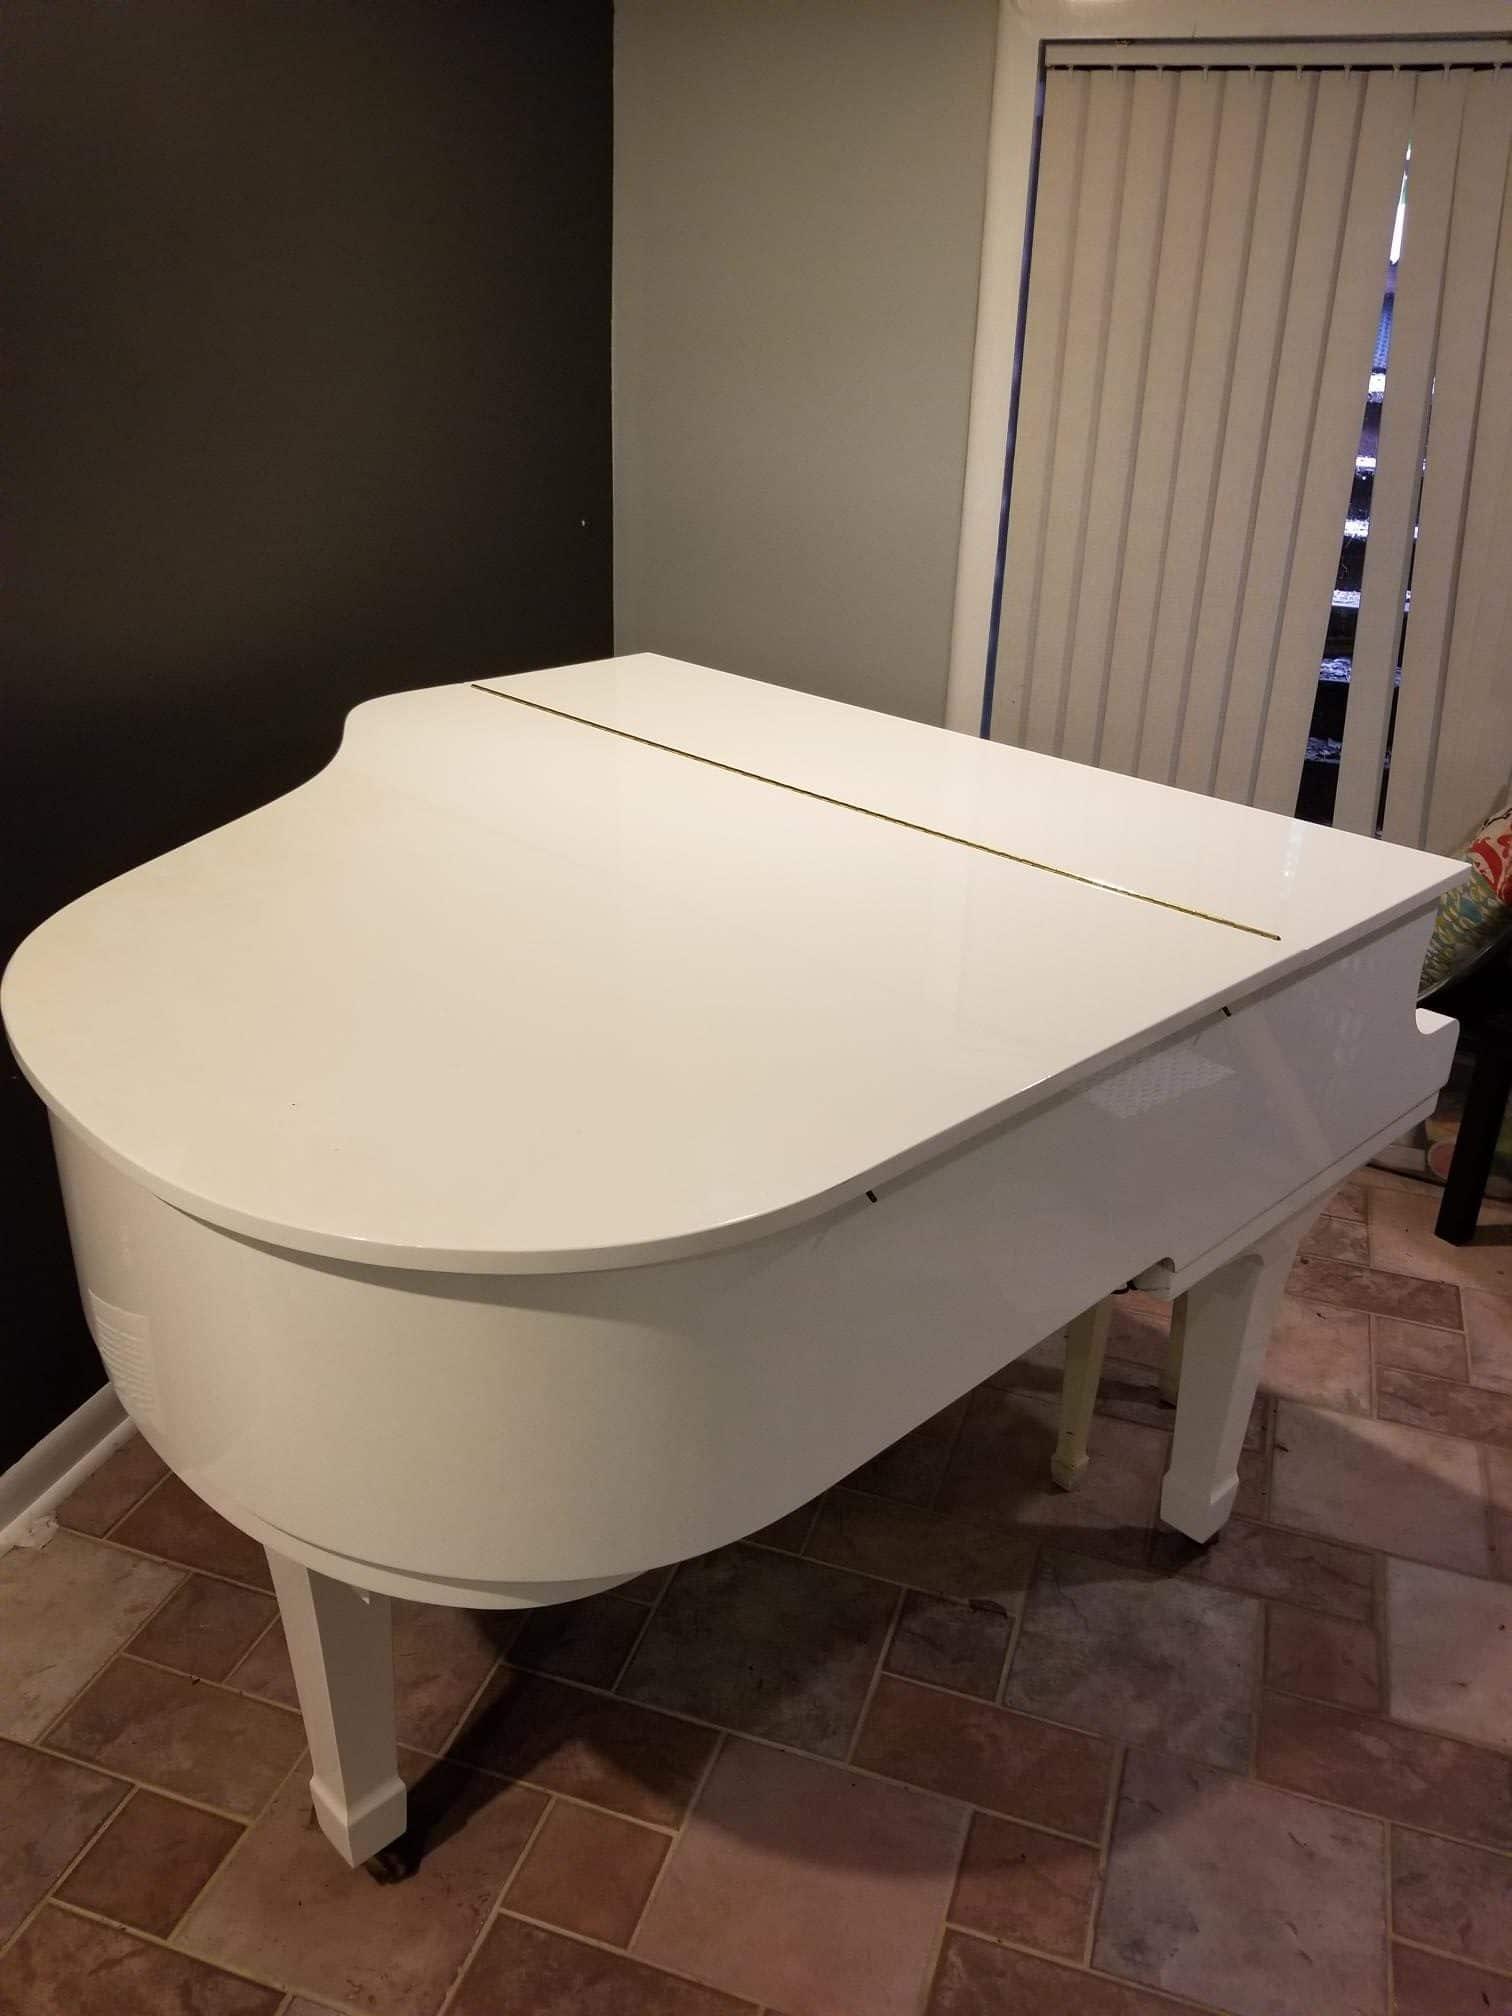 piano movers maryland